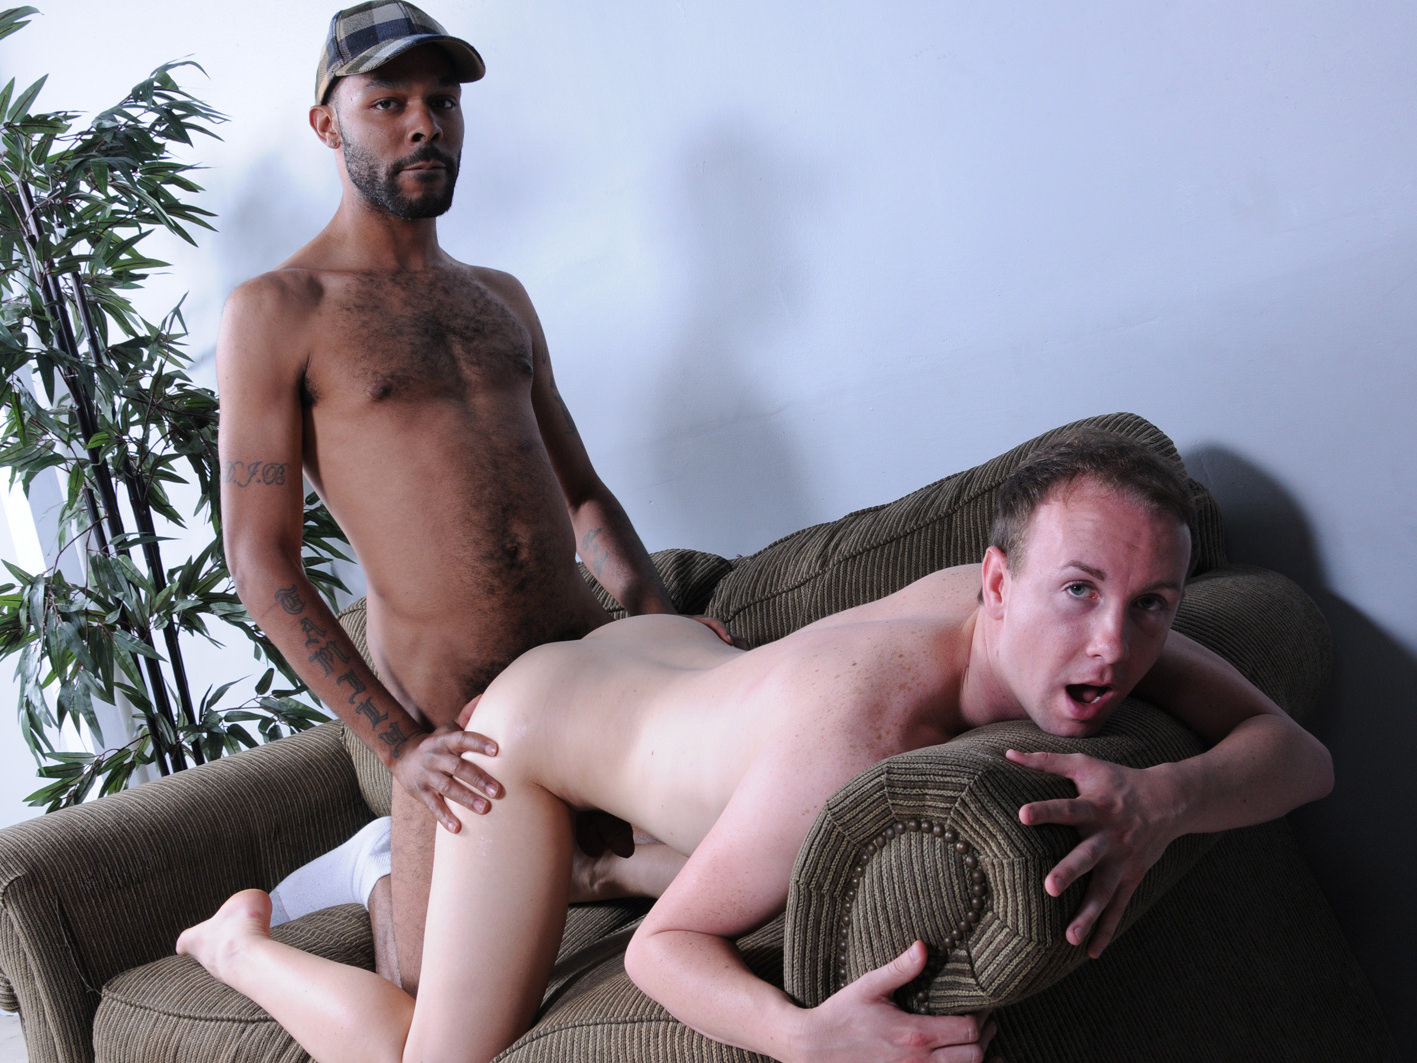 Gay Porn (Gay),Big Cock,Blowjobs (Gay),Interracial (Gay),Blacks on Boys,HD Gays,Black Cock,Big Black,Black